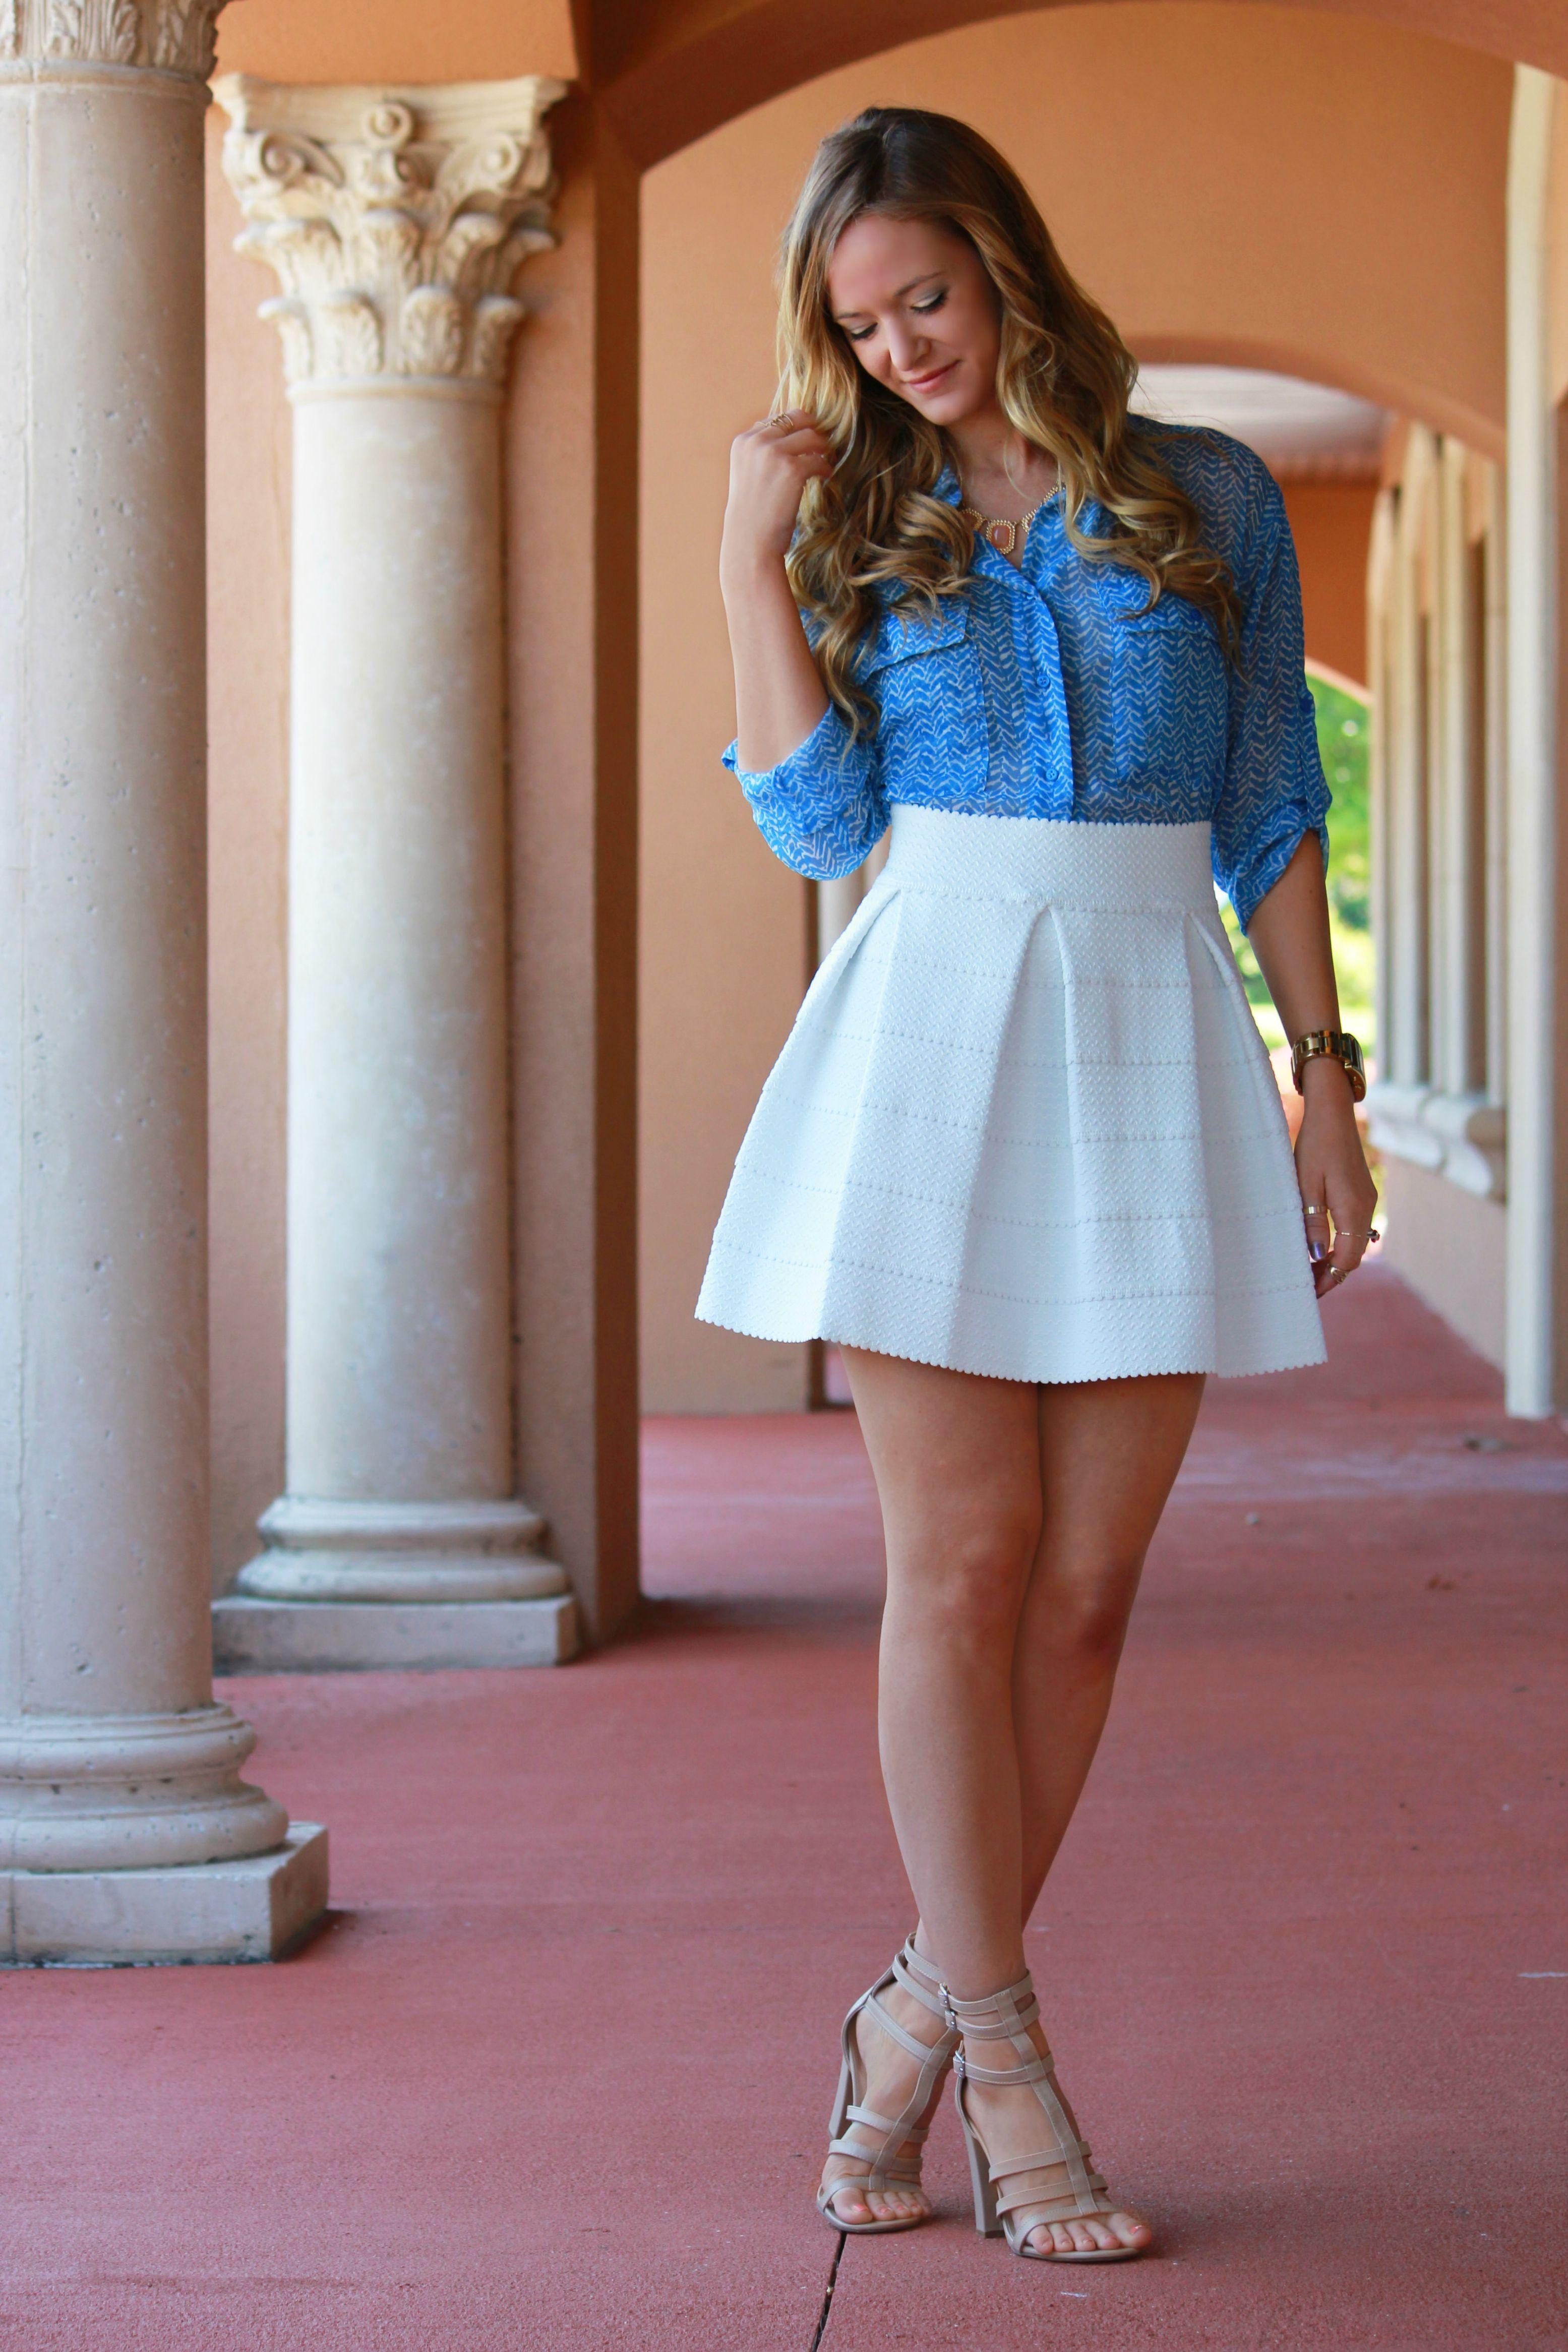 c771e1cc78 Spring outfit  white skater skirt and blue shirt